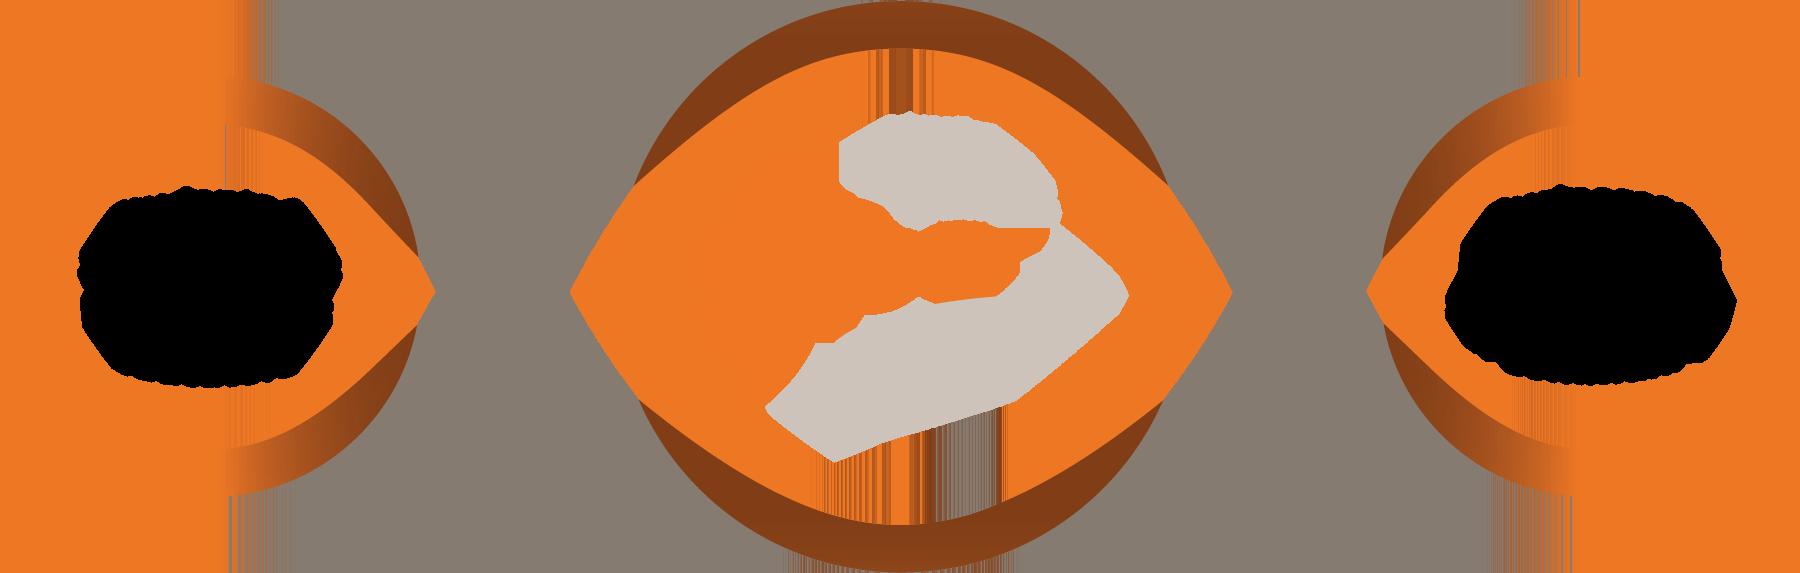 GPS Education Partners Work-based Learning Programs